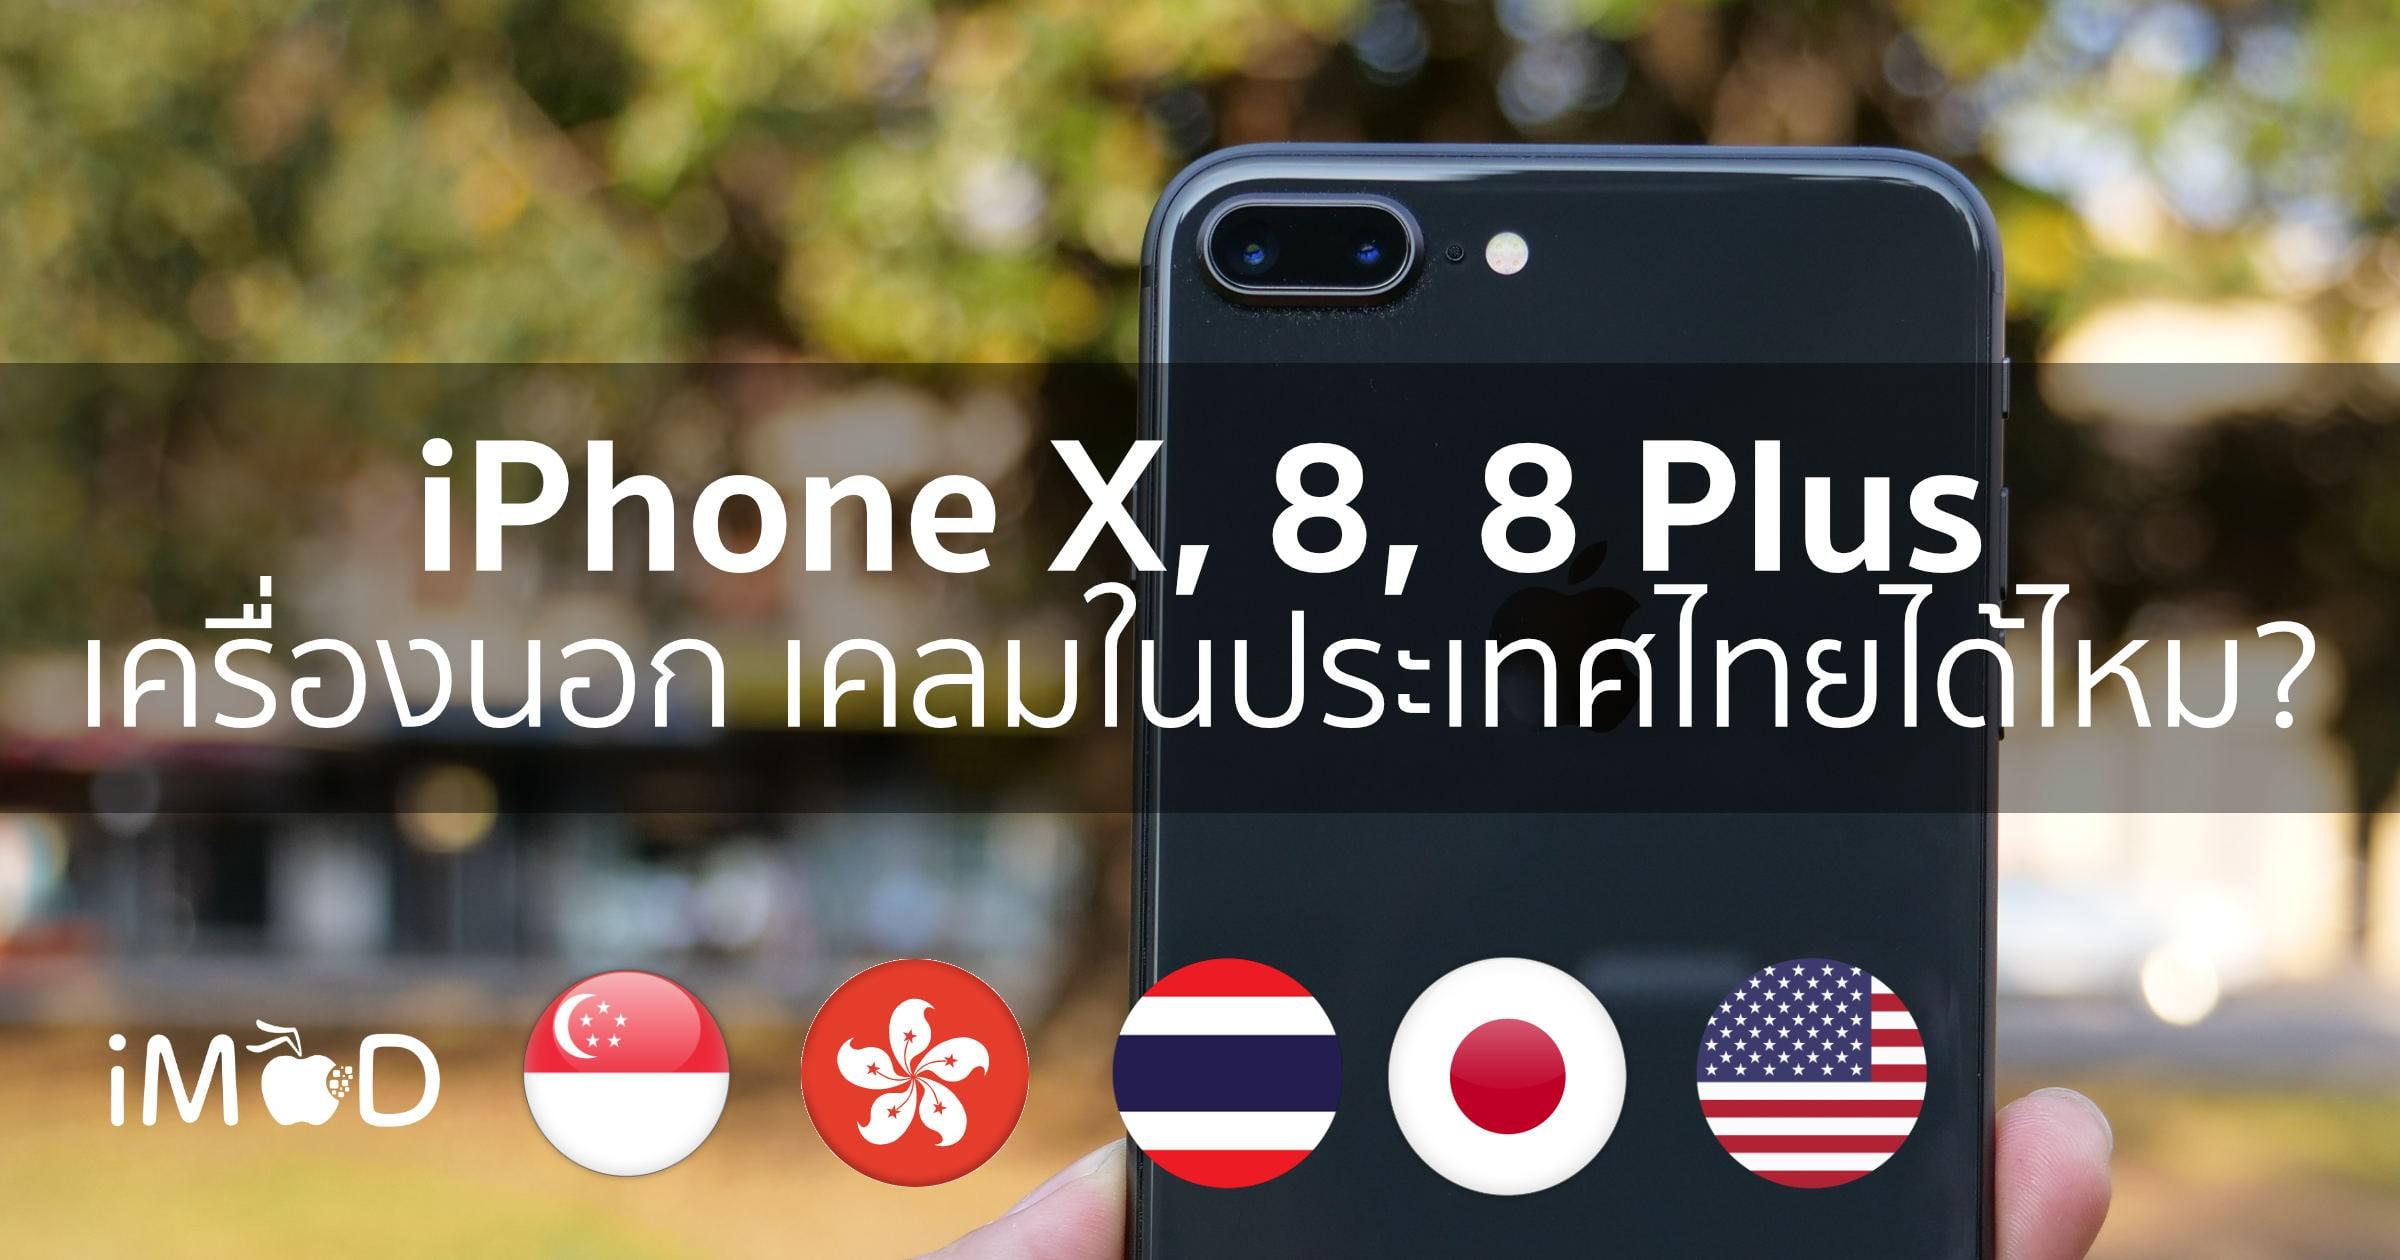 iPhone X, 8, 8 Plus เครื่องนอก เคลมในประเทศไทยได้ไหม ...